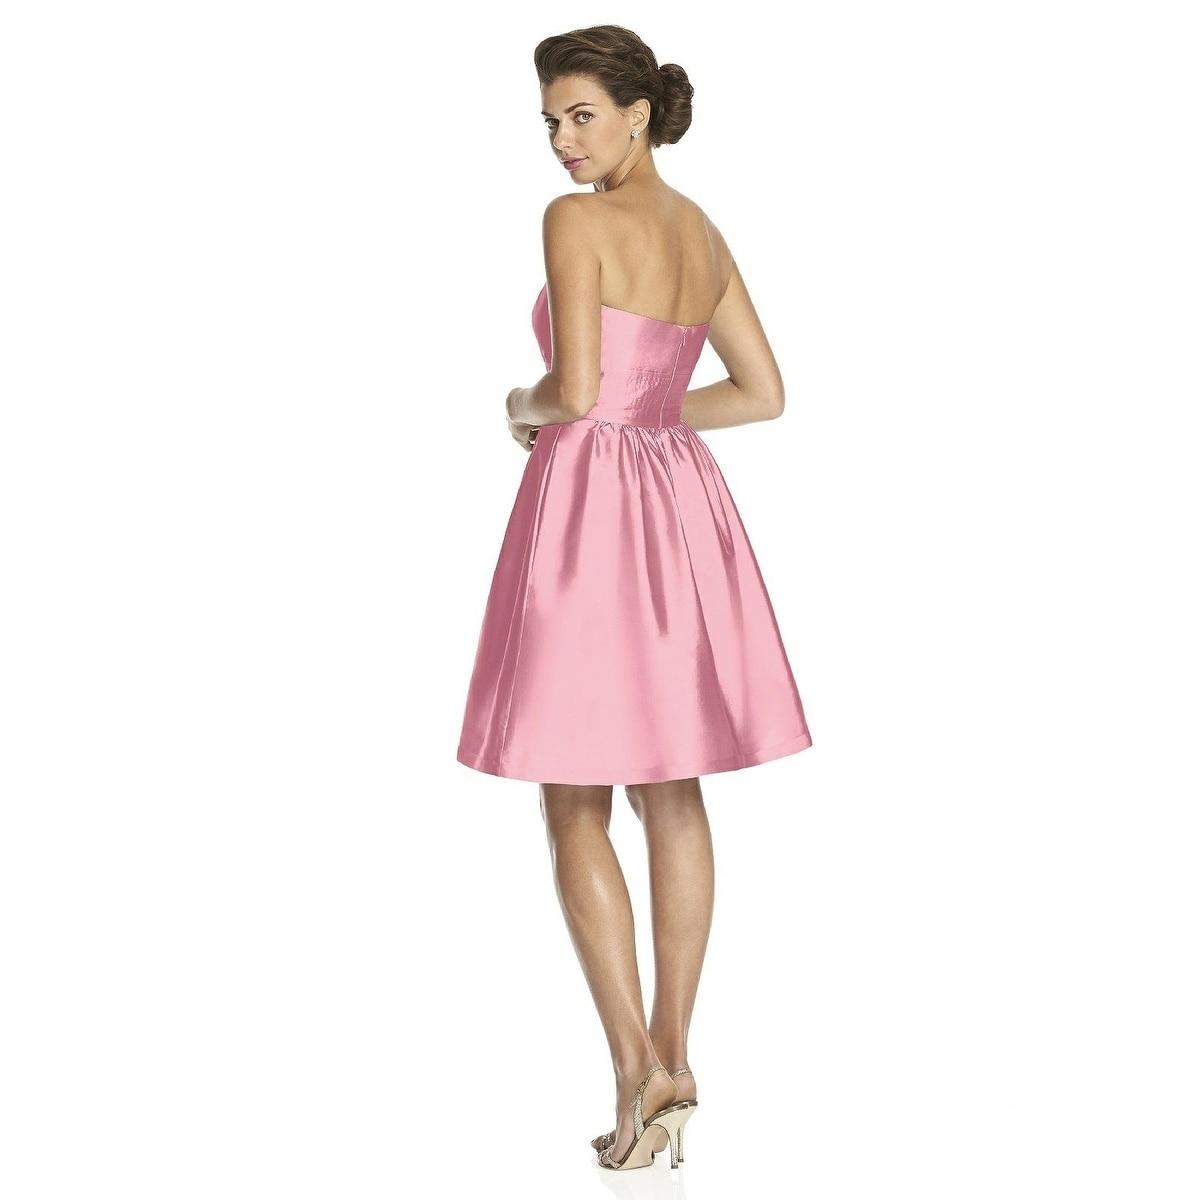 Alfred Sung Womens Strapless Cocktail Length Peau De Soie Dress by Italian Plum Size 12